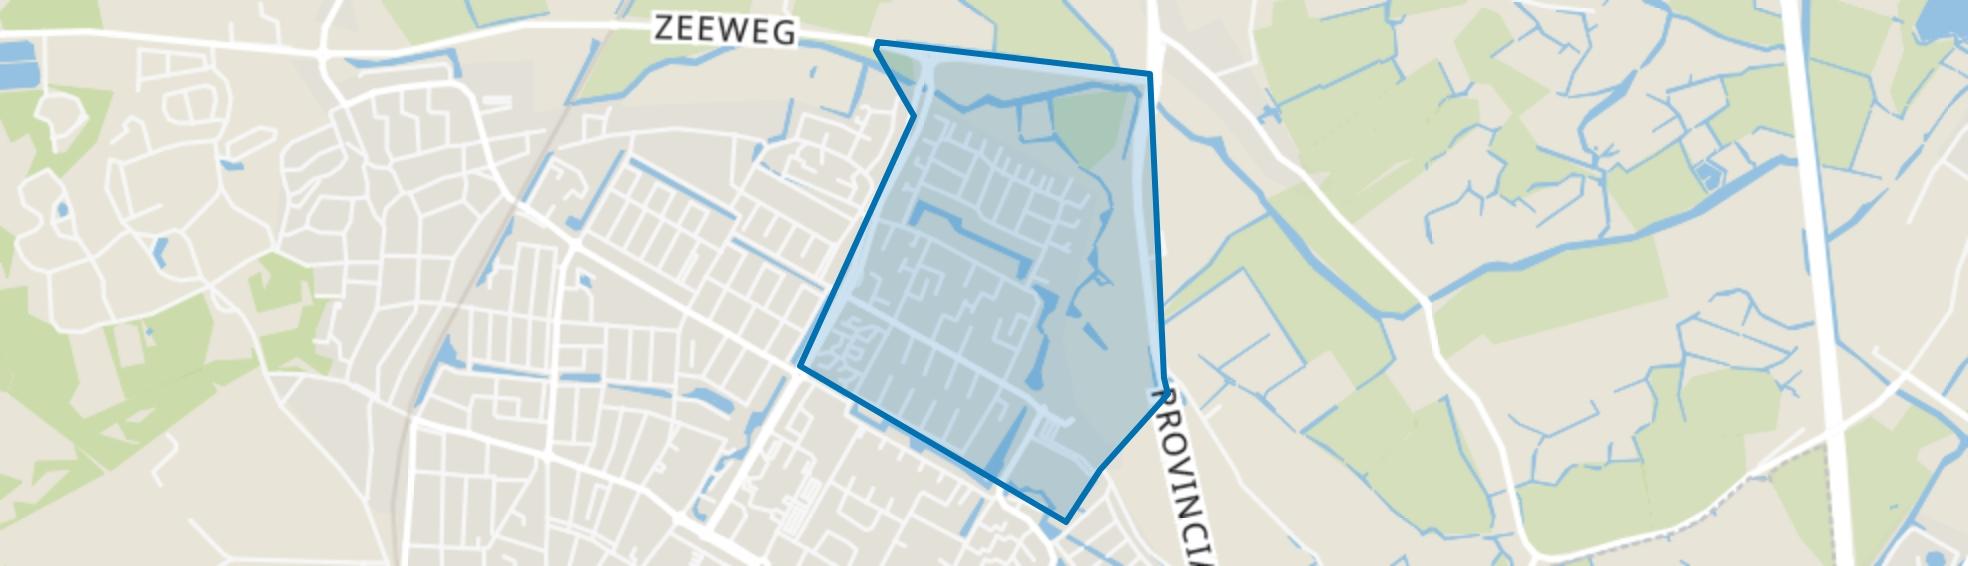 Noord-End, Castricum map